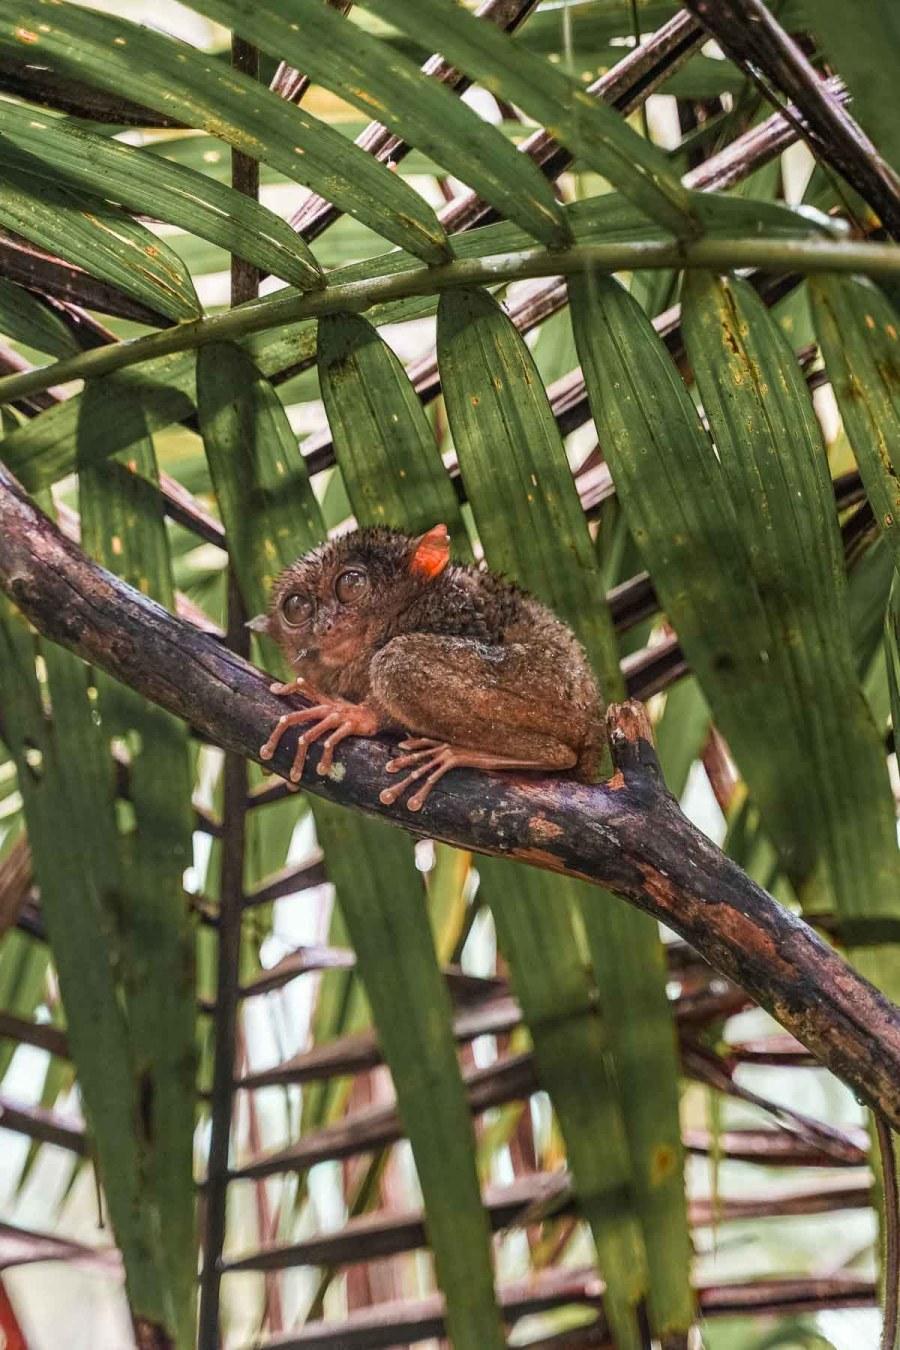 Cute looking tarsier in the Tarsier Sanctuary in Bohol, Philippines